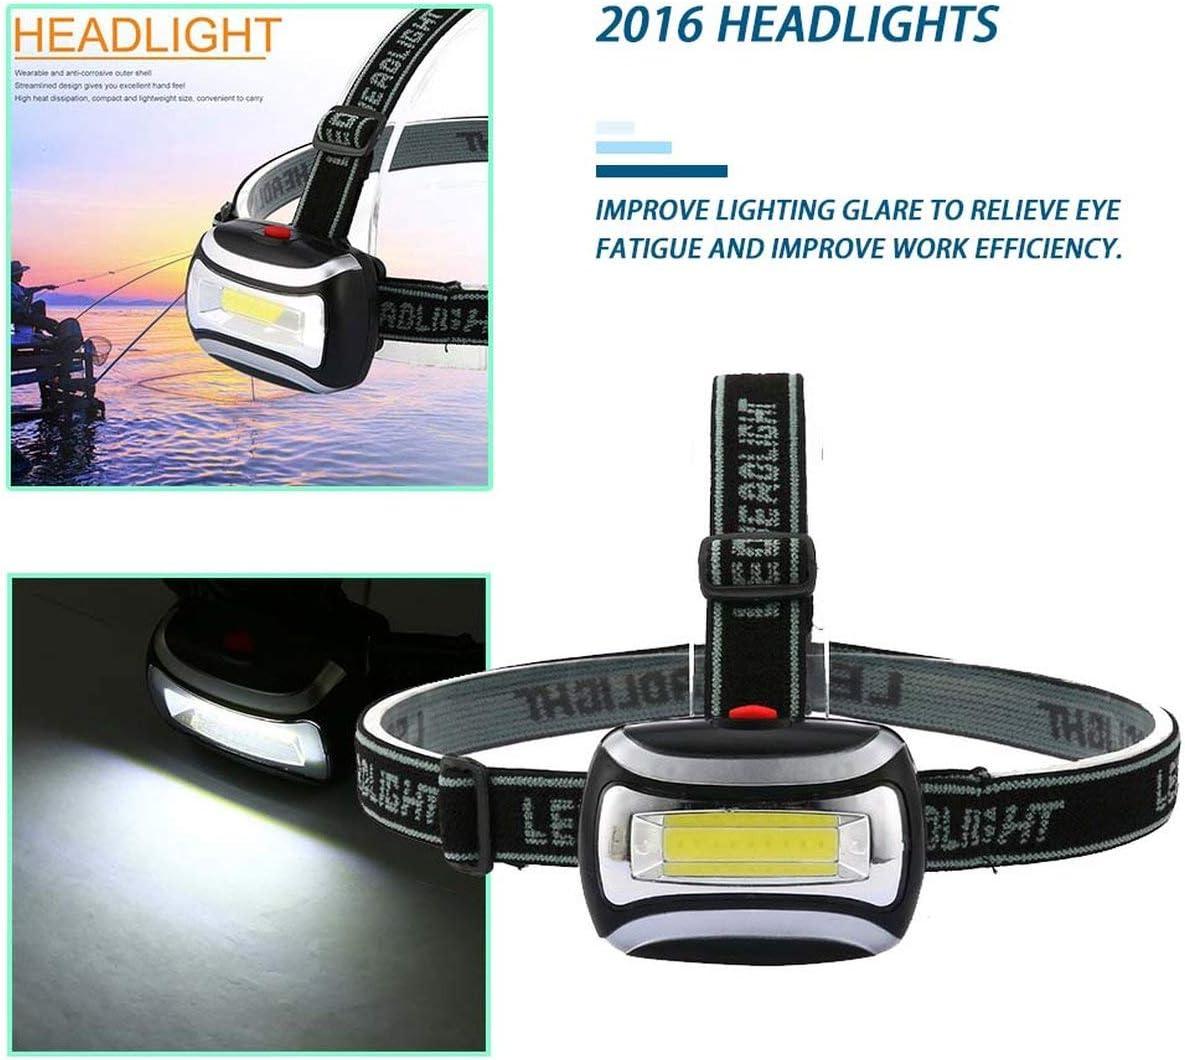 negro YUIO 2000LM impermeable LED linterna frontal linterna frontal linterna frontal linterna de luz duradera linterna de camping pesca